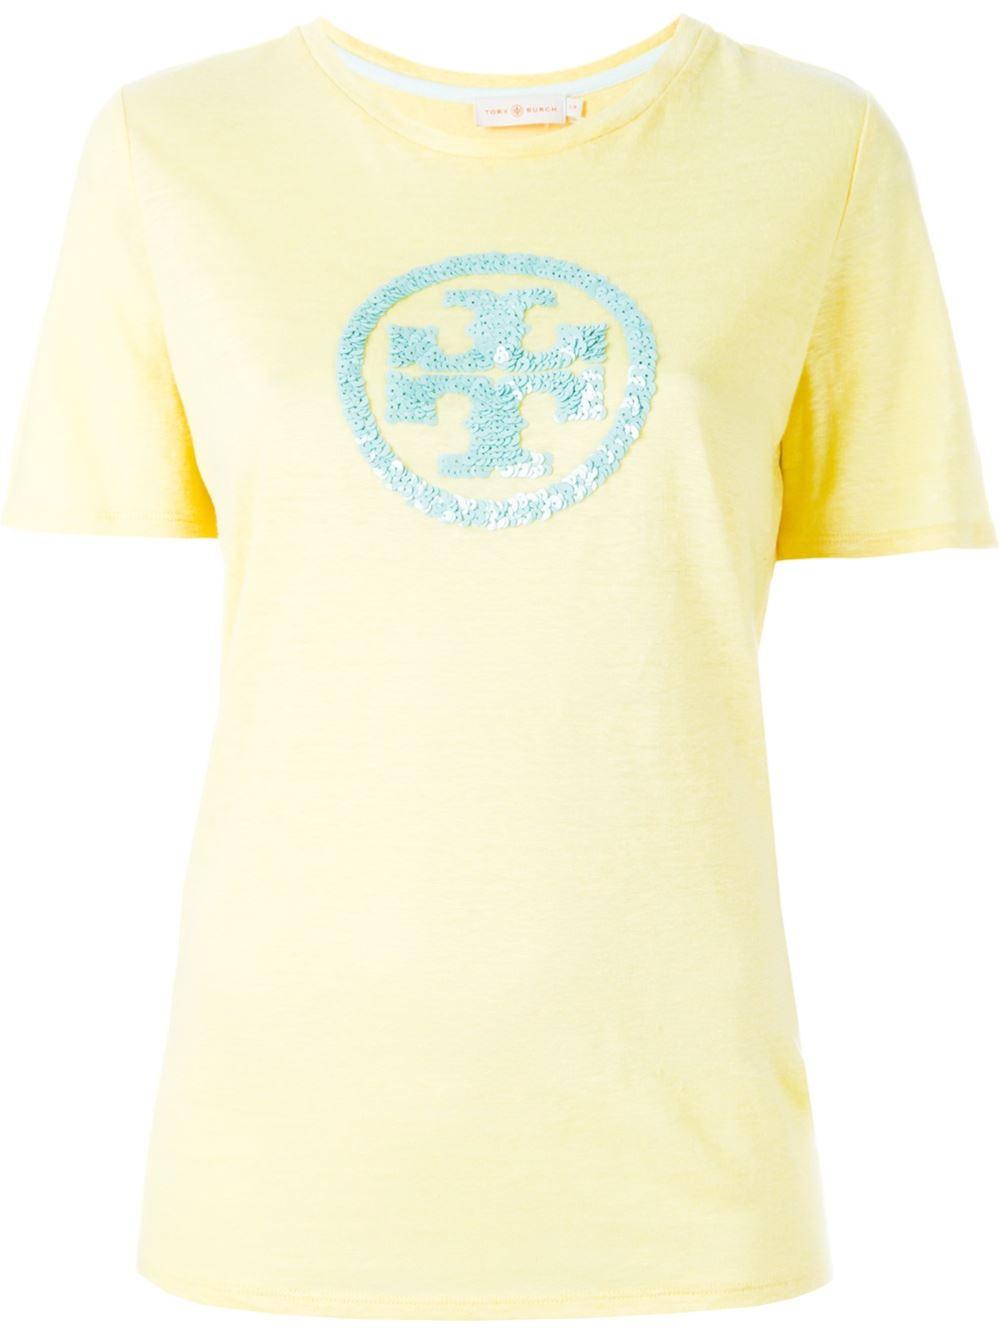 Lyst tory burch sequined logo t shirt for Tory burch t shirt